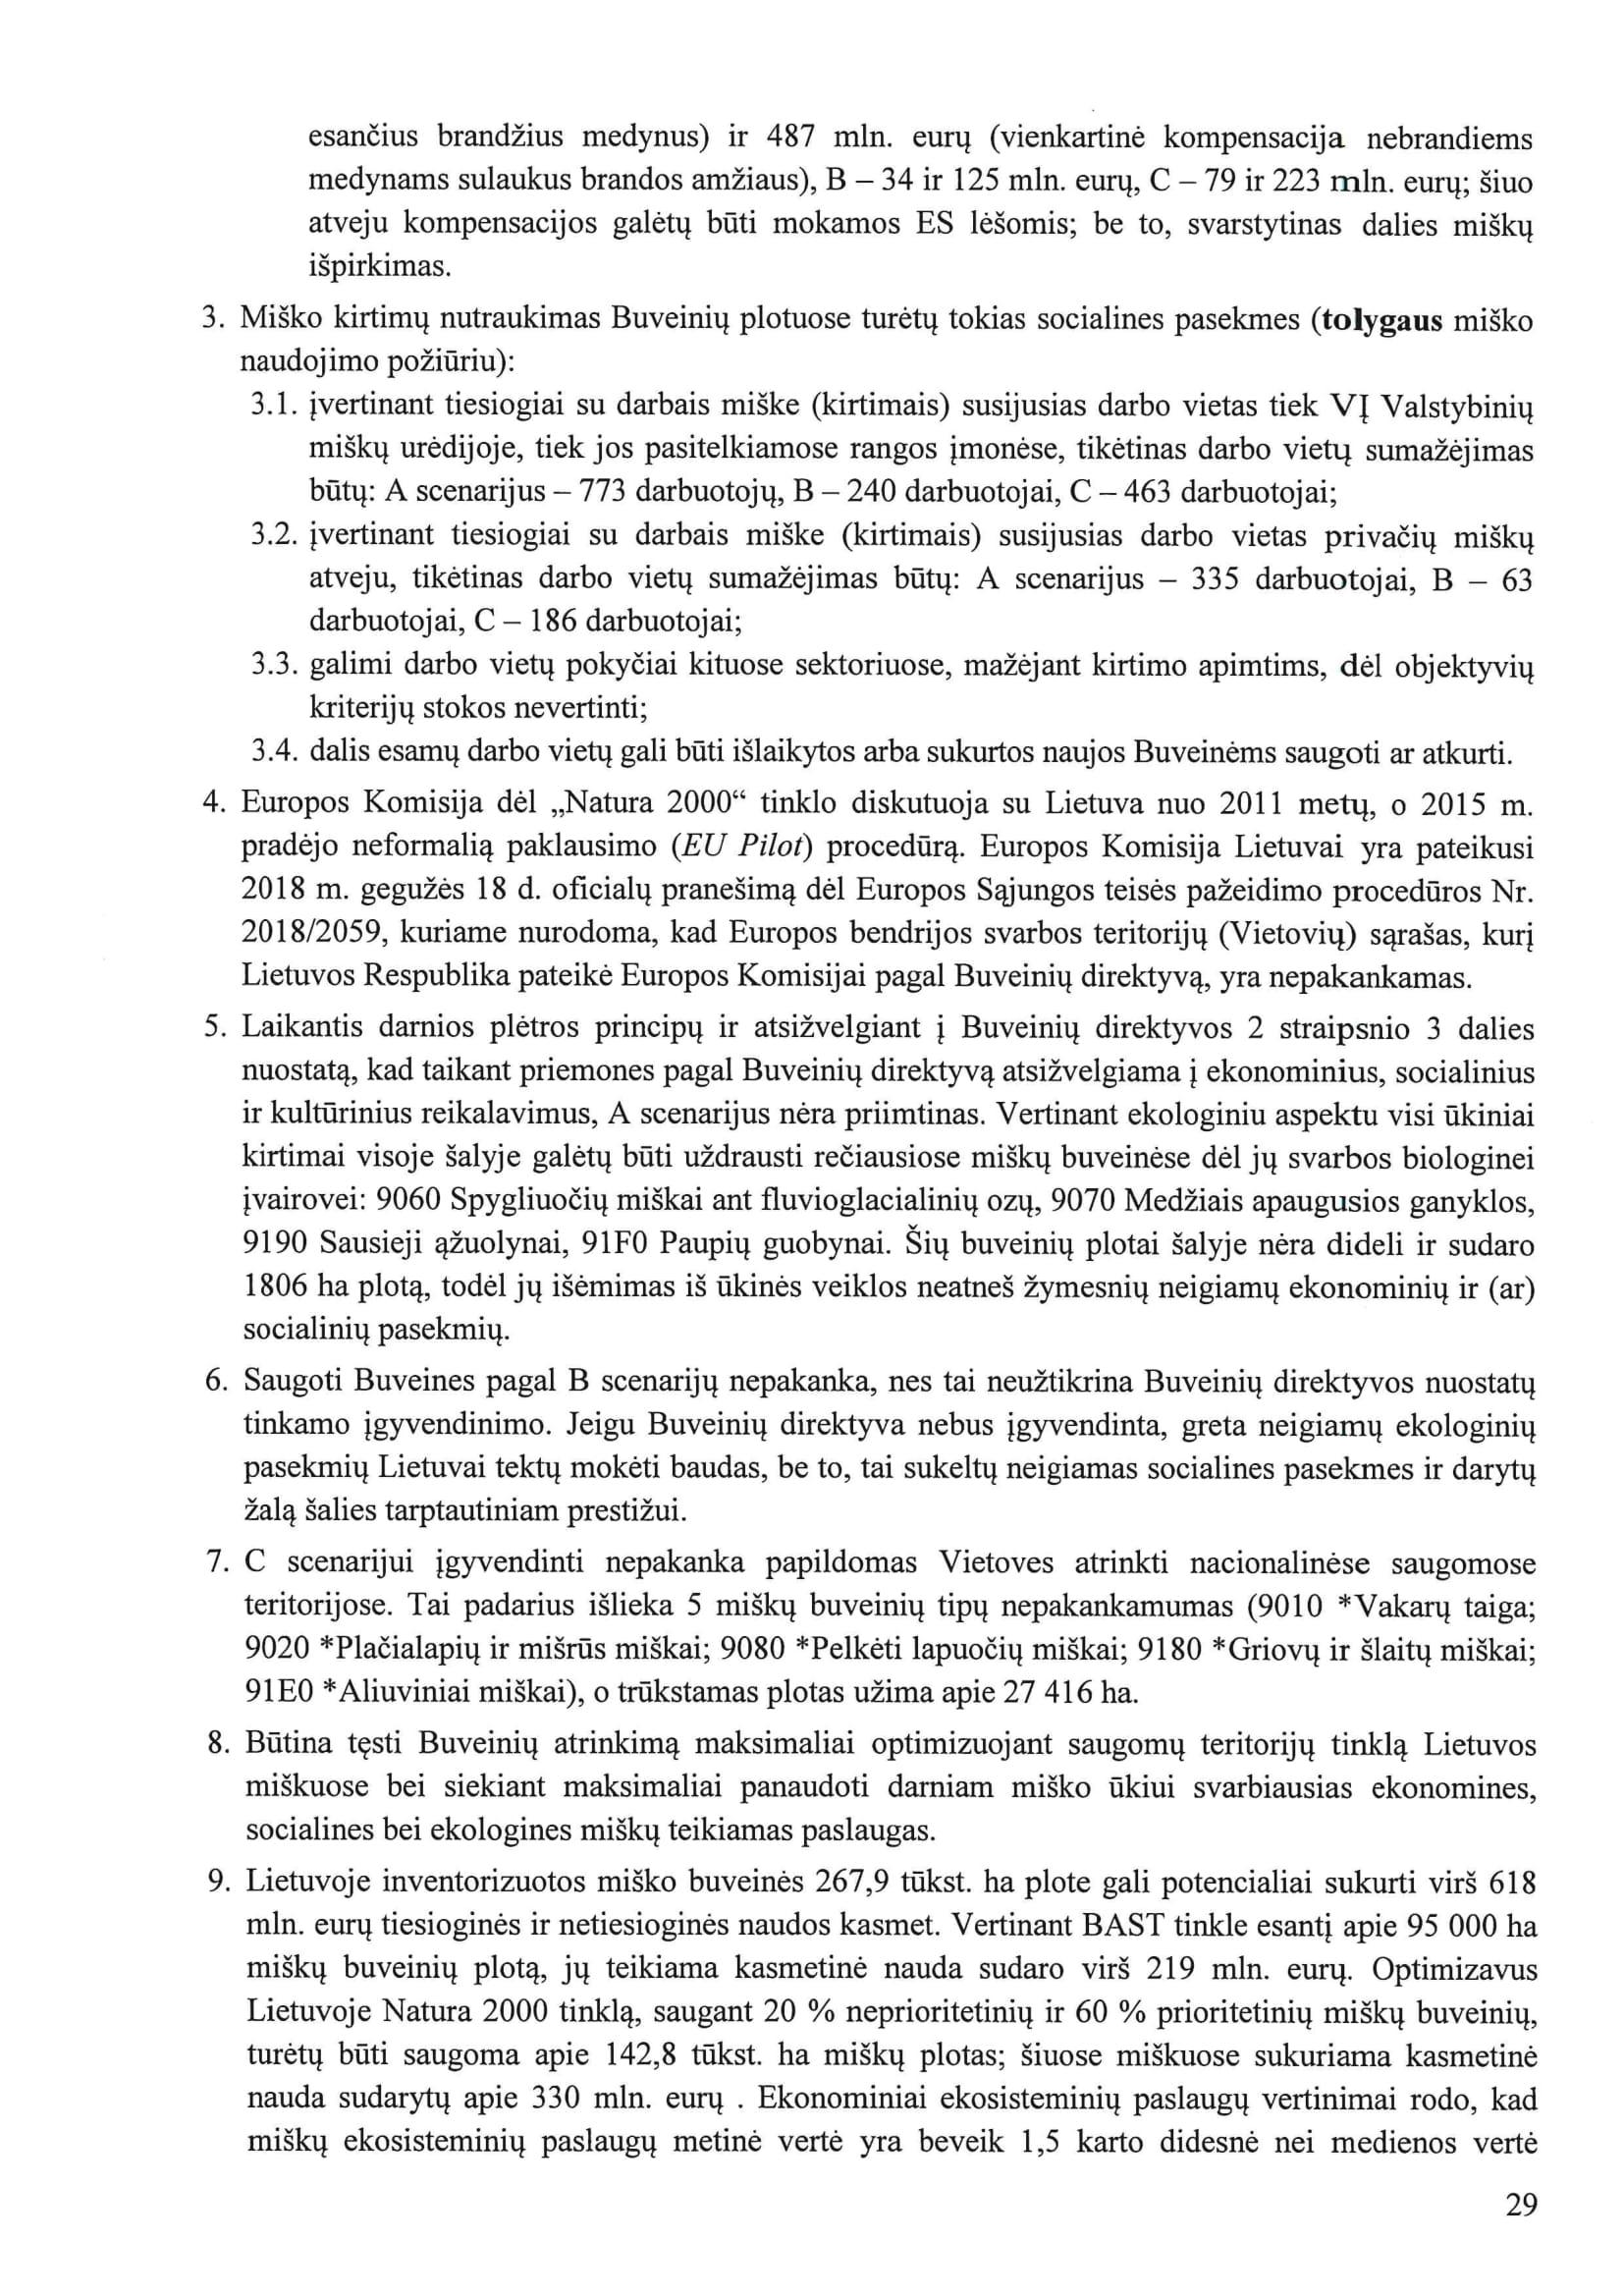 EB buveiniu Pazyma VMT VMU VSTT 2019.01.23 (su parasais)[38073]-29